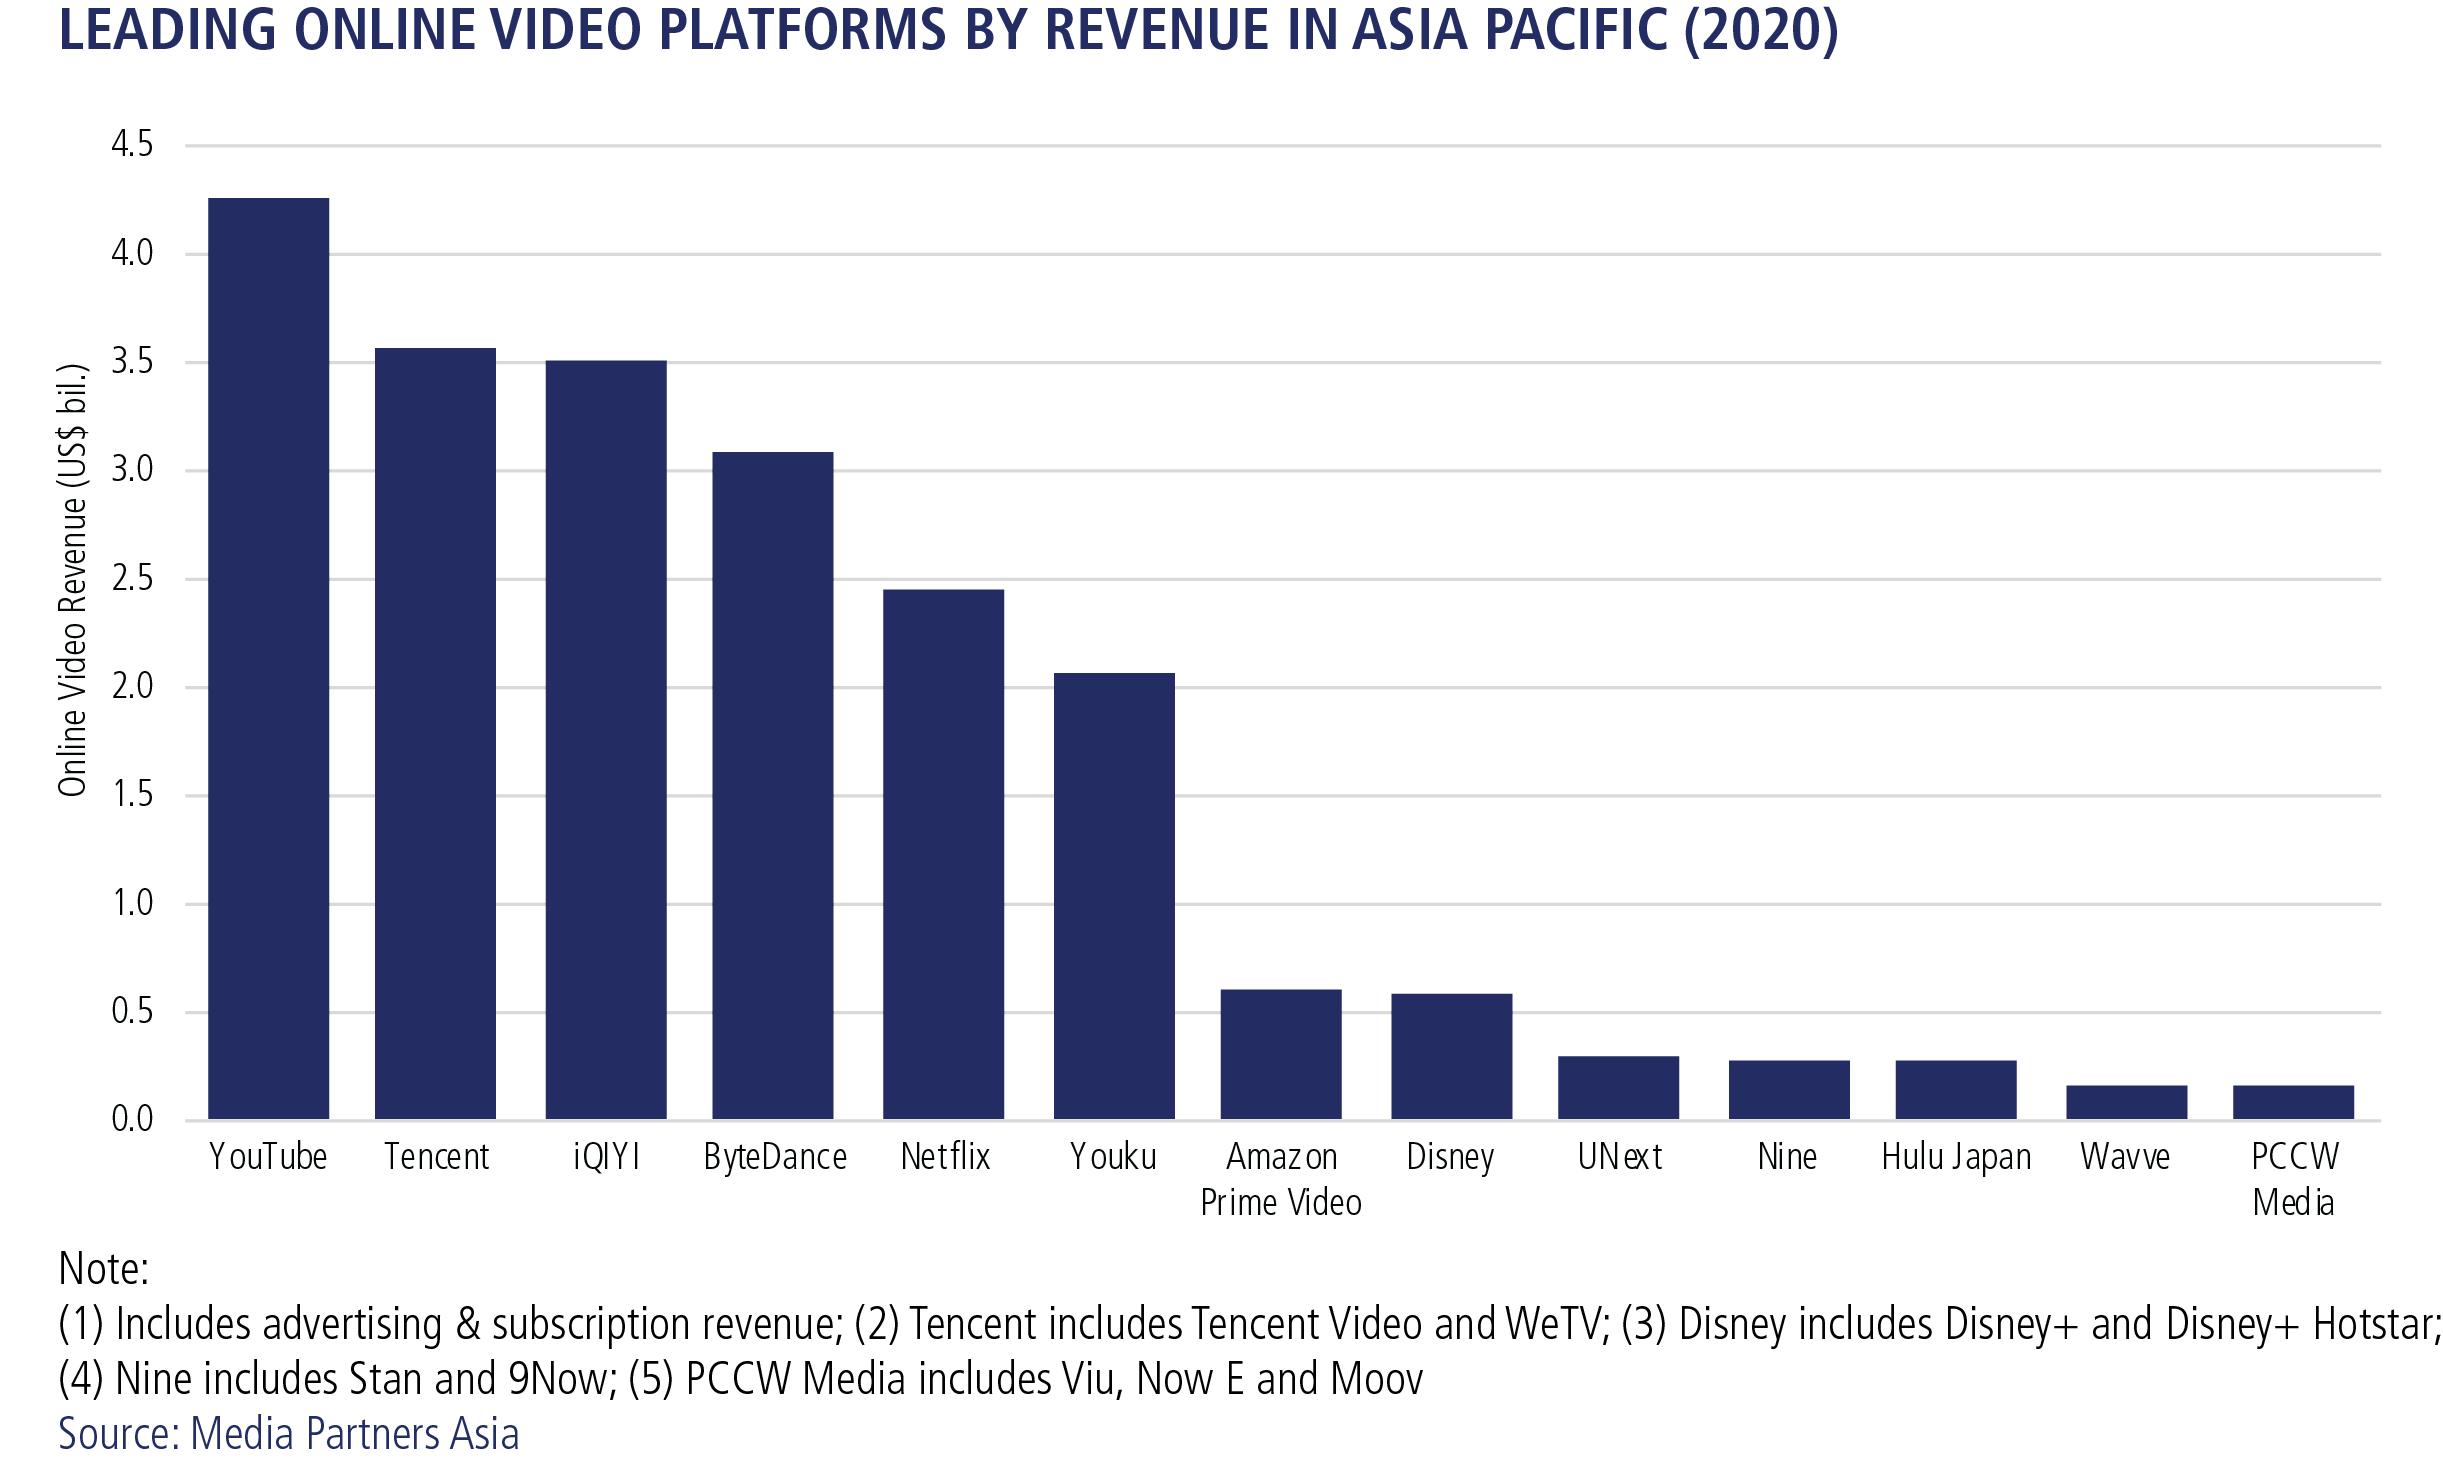 Leading Online Video Platforms By Revenue in Asia Pacific - YouTube, Tencent (Tencent Video, WeTV), iQIYI, ByteDance, Netflix, Youku, Amazon Prime Video, Disney (Disney+, Disney+ Hotstar), UNext, Nine (Stan, 9Now), Hulu Japan, Wavve, PCCW Media (Viu, Now E, Moov) - 2020